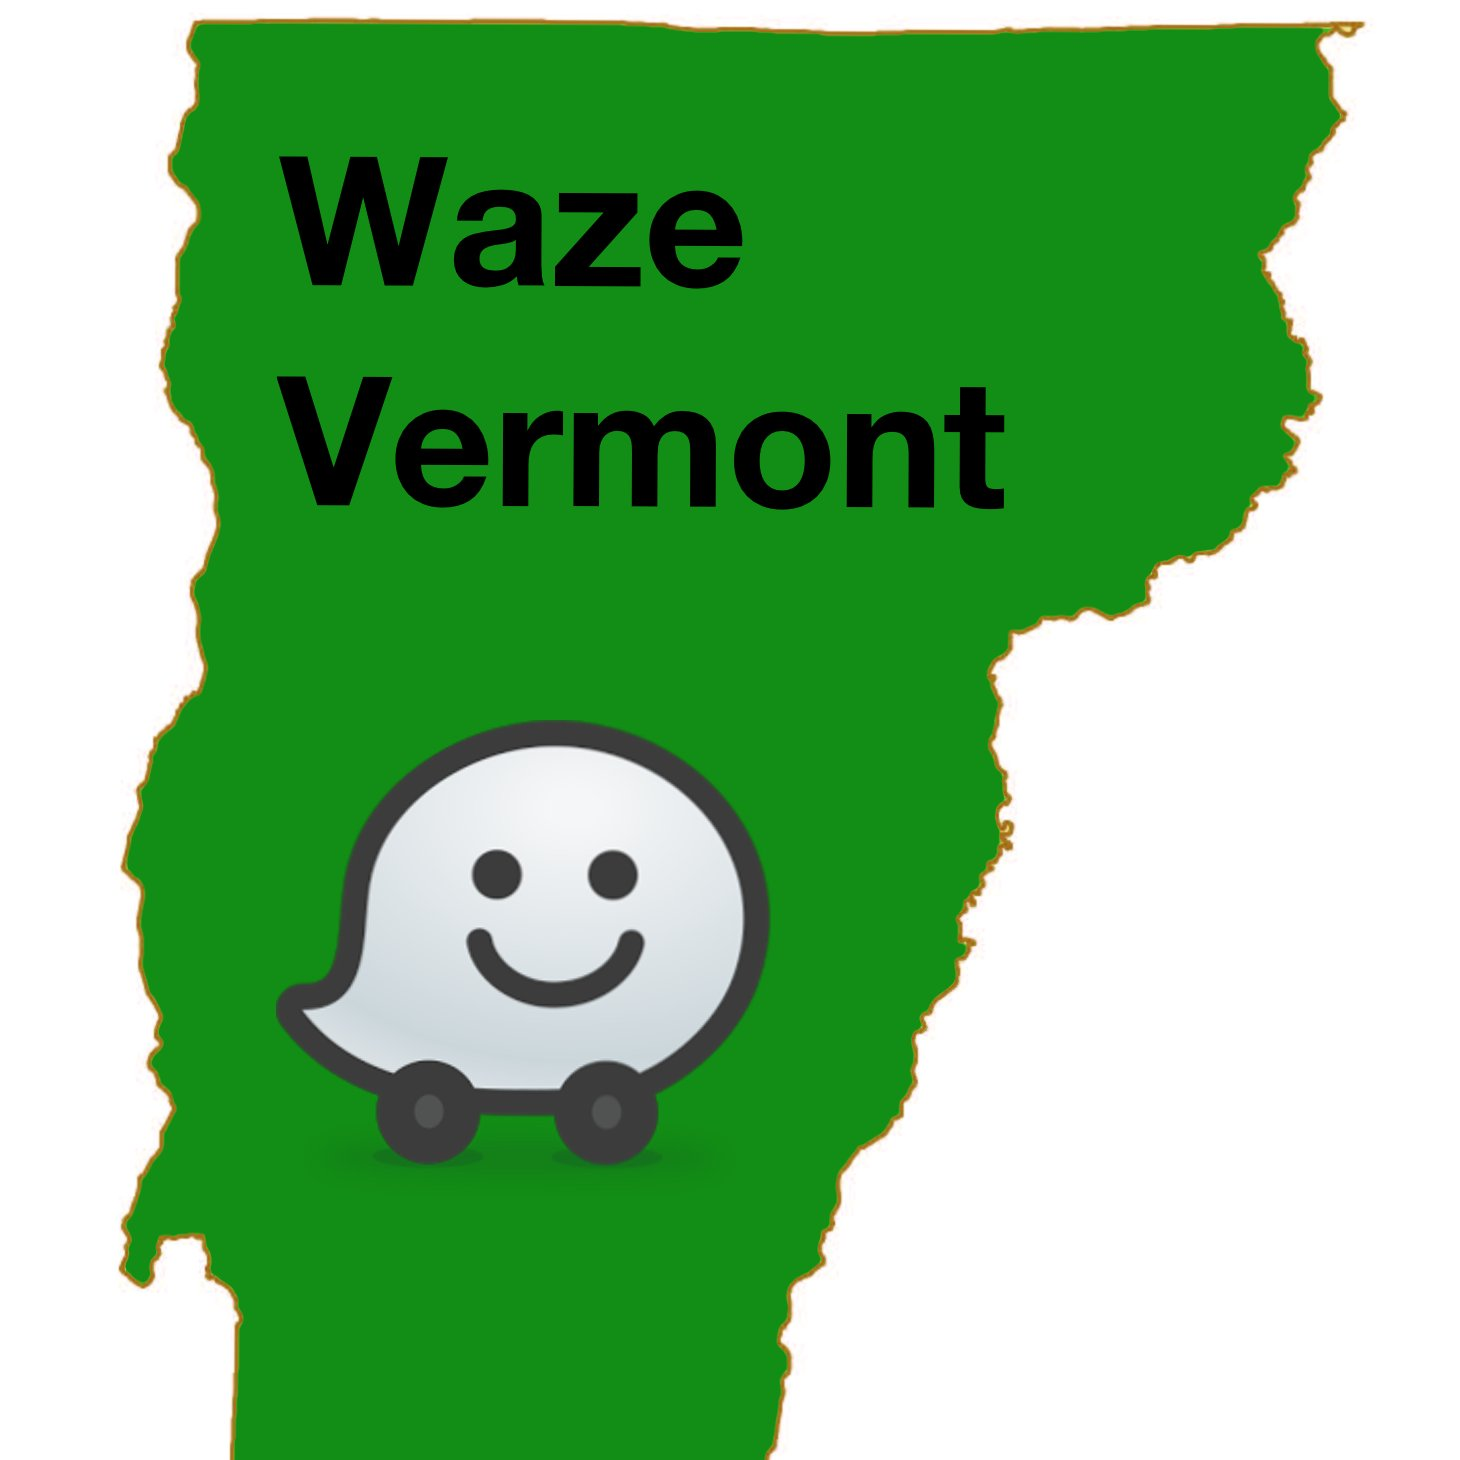 Waze Vermont